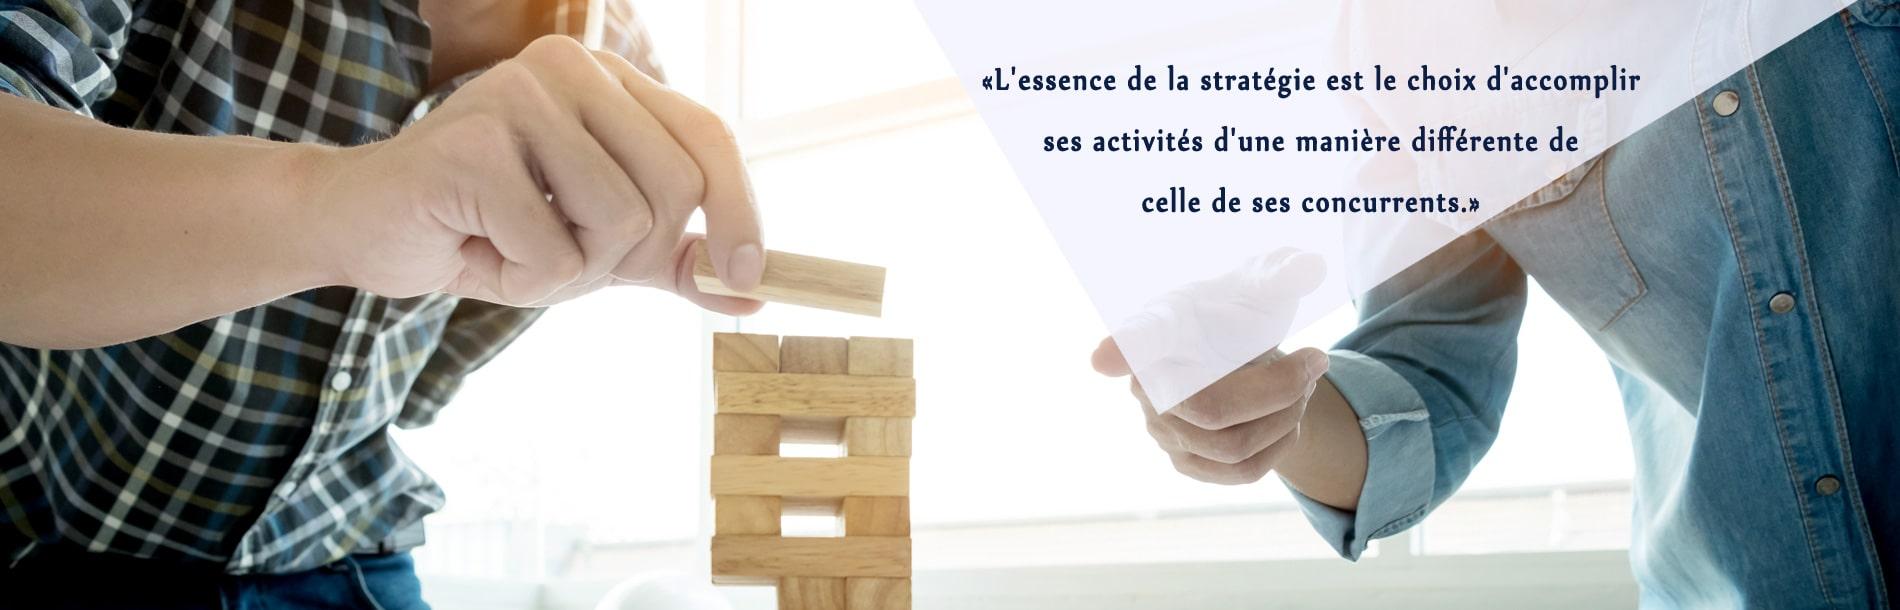 stratégie citation